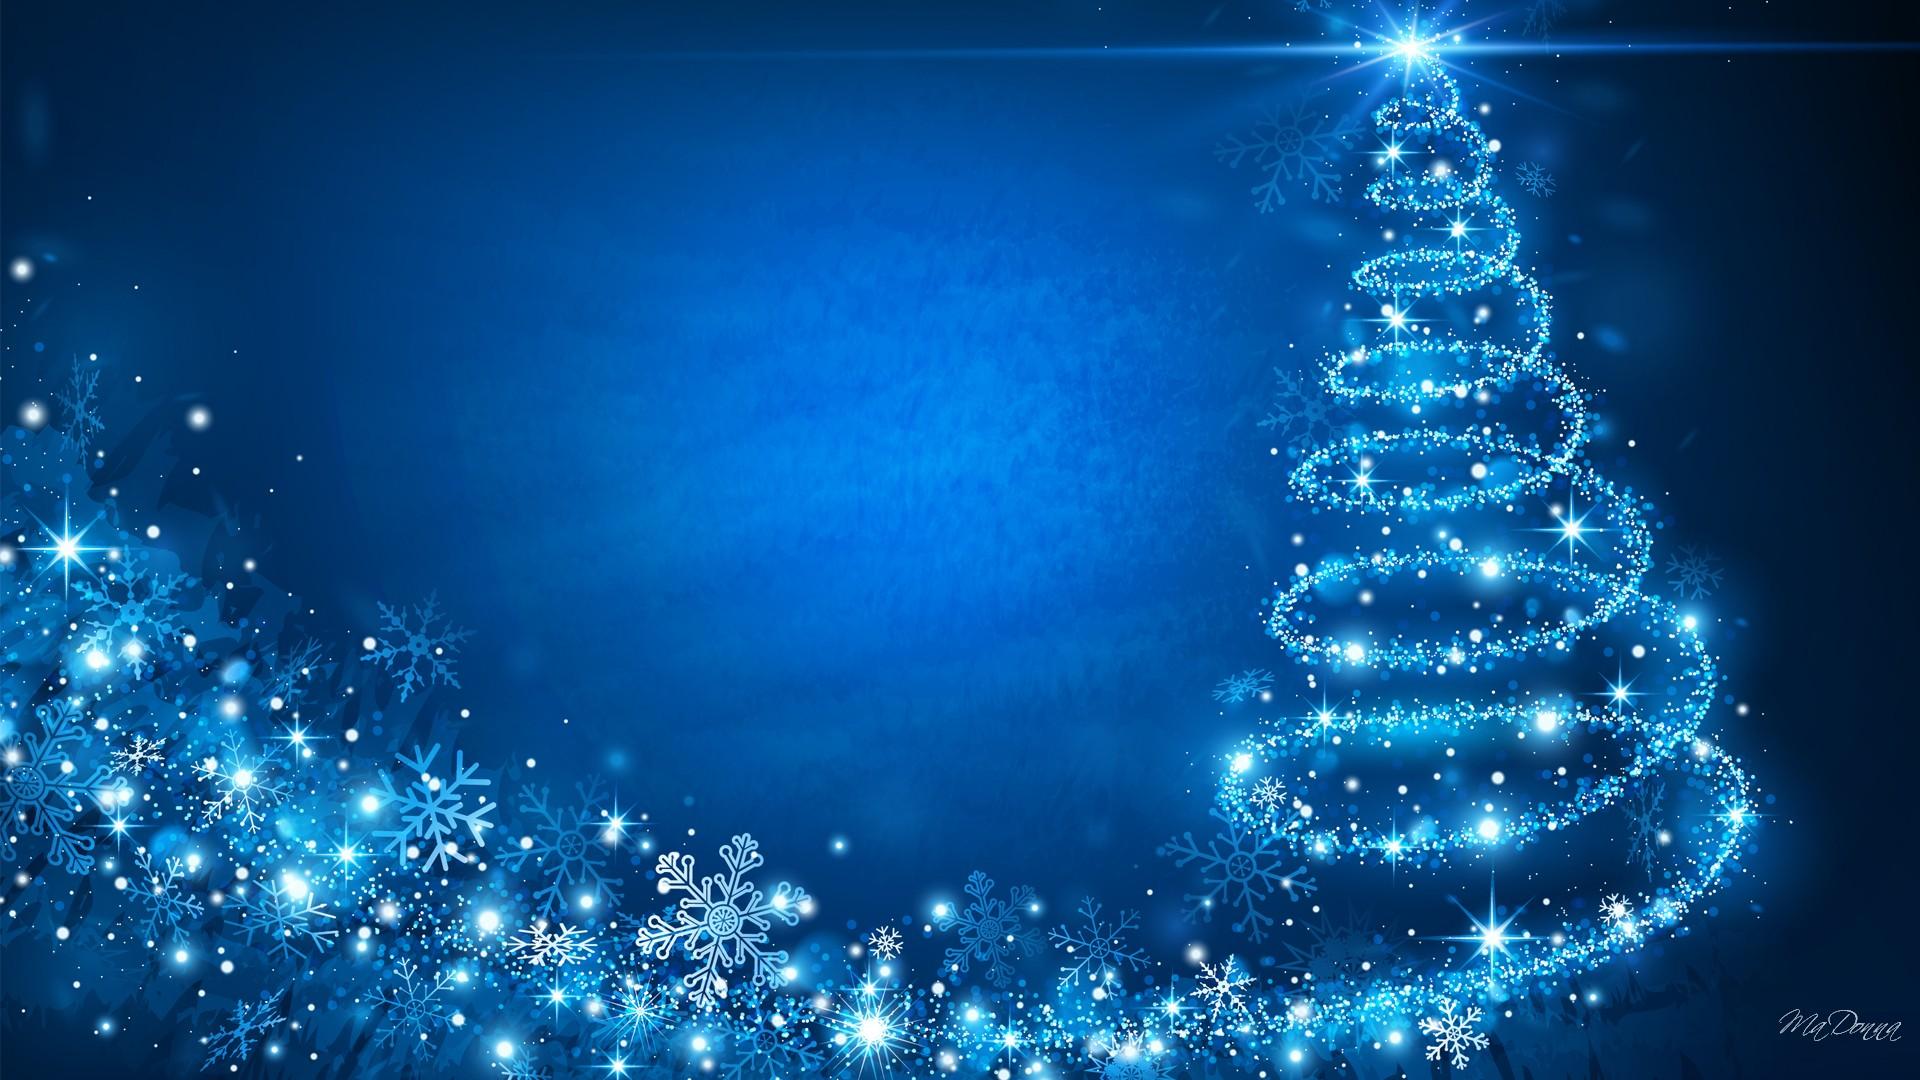 blue christmas - Blue Christmas